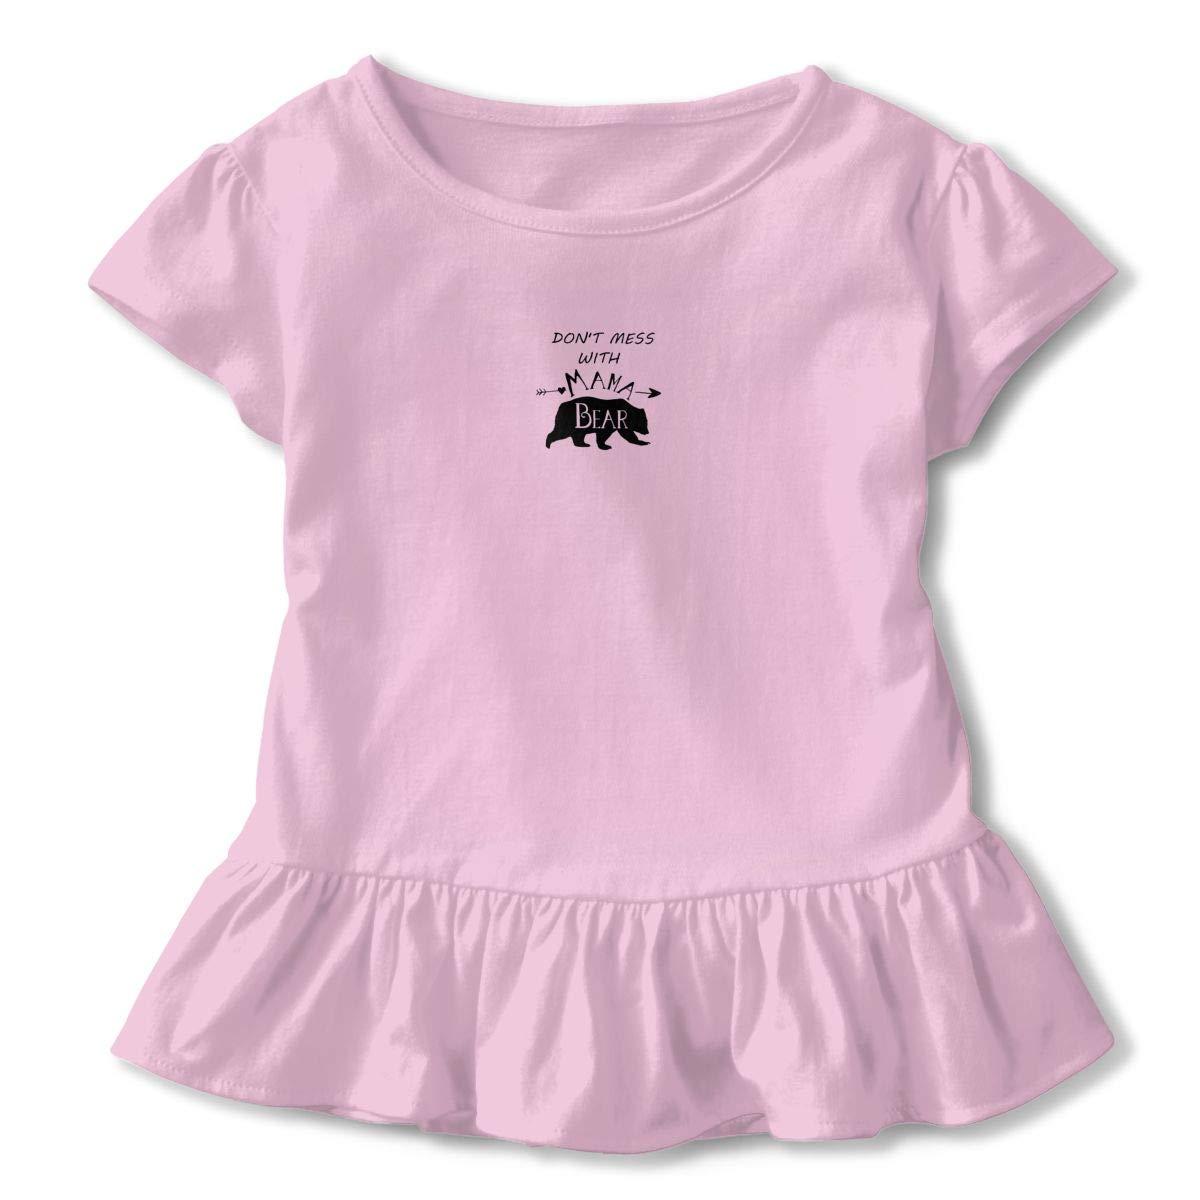 Dont Mess Mama Bear Toddler Baby Girl Basic Printed Ruffle Short Sleeve Cotton T Shirts Tops Tee Clothes Pink